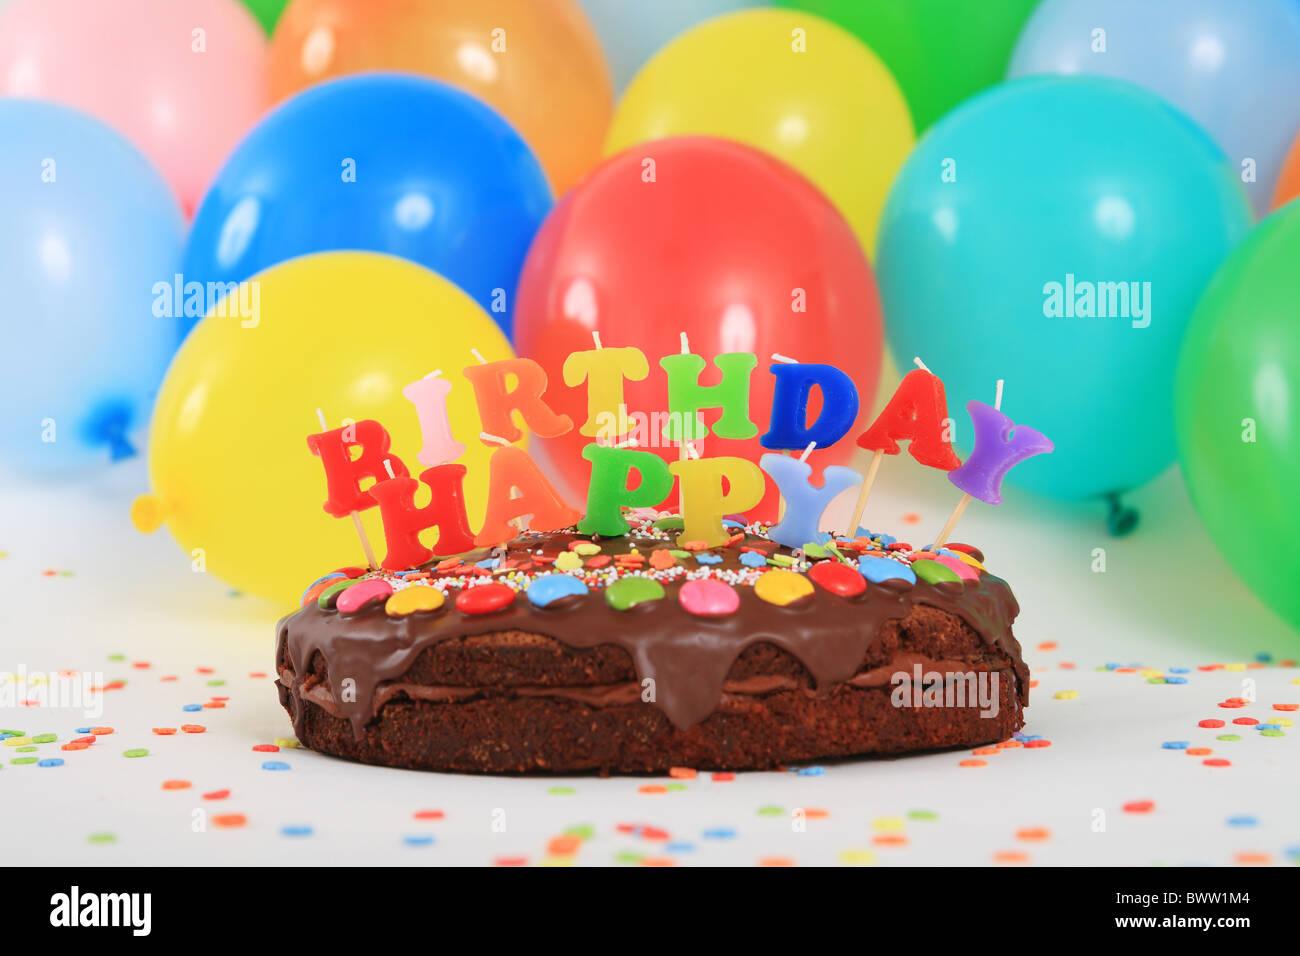 Birthday Cakes Happy Birthday Cake Candles Balloons Party Decoration Adornment Studio Celebration Colorful C Stock Photo Alamy